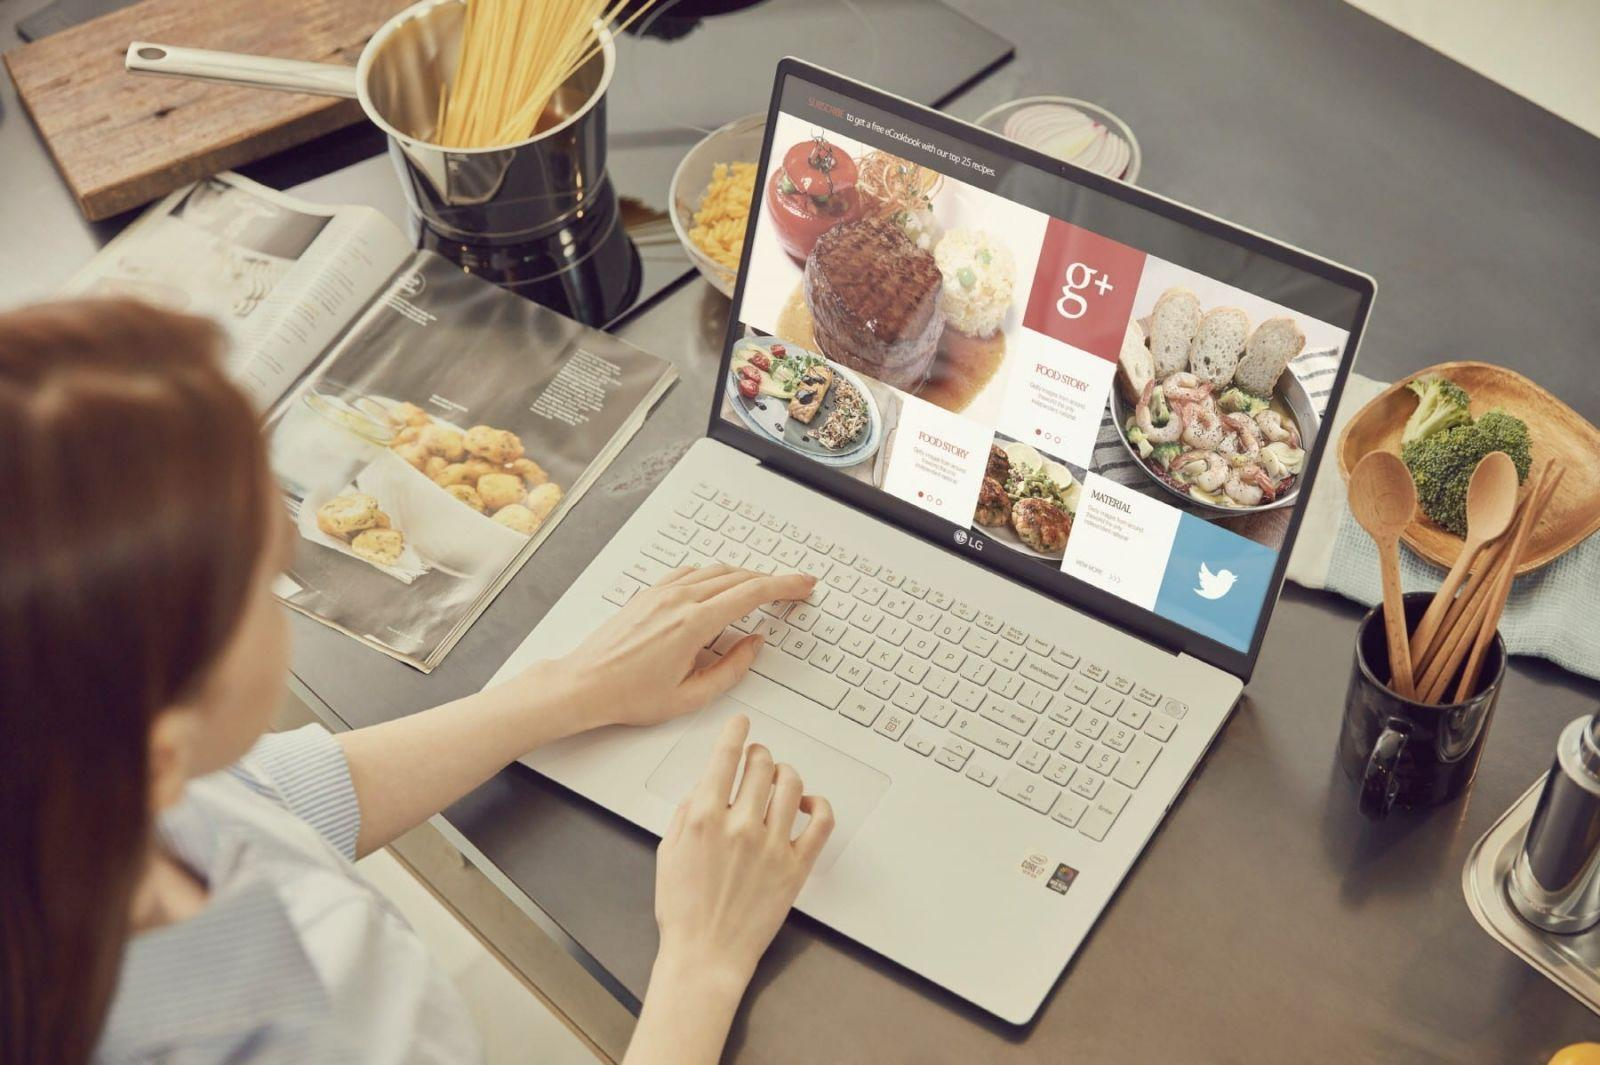 LG представила линейку ноутбуков Gram (ooo)